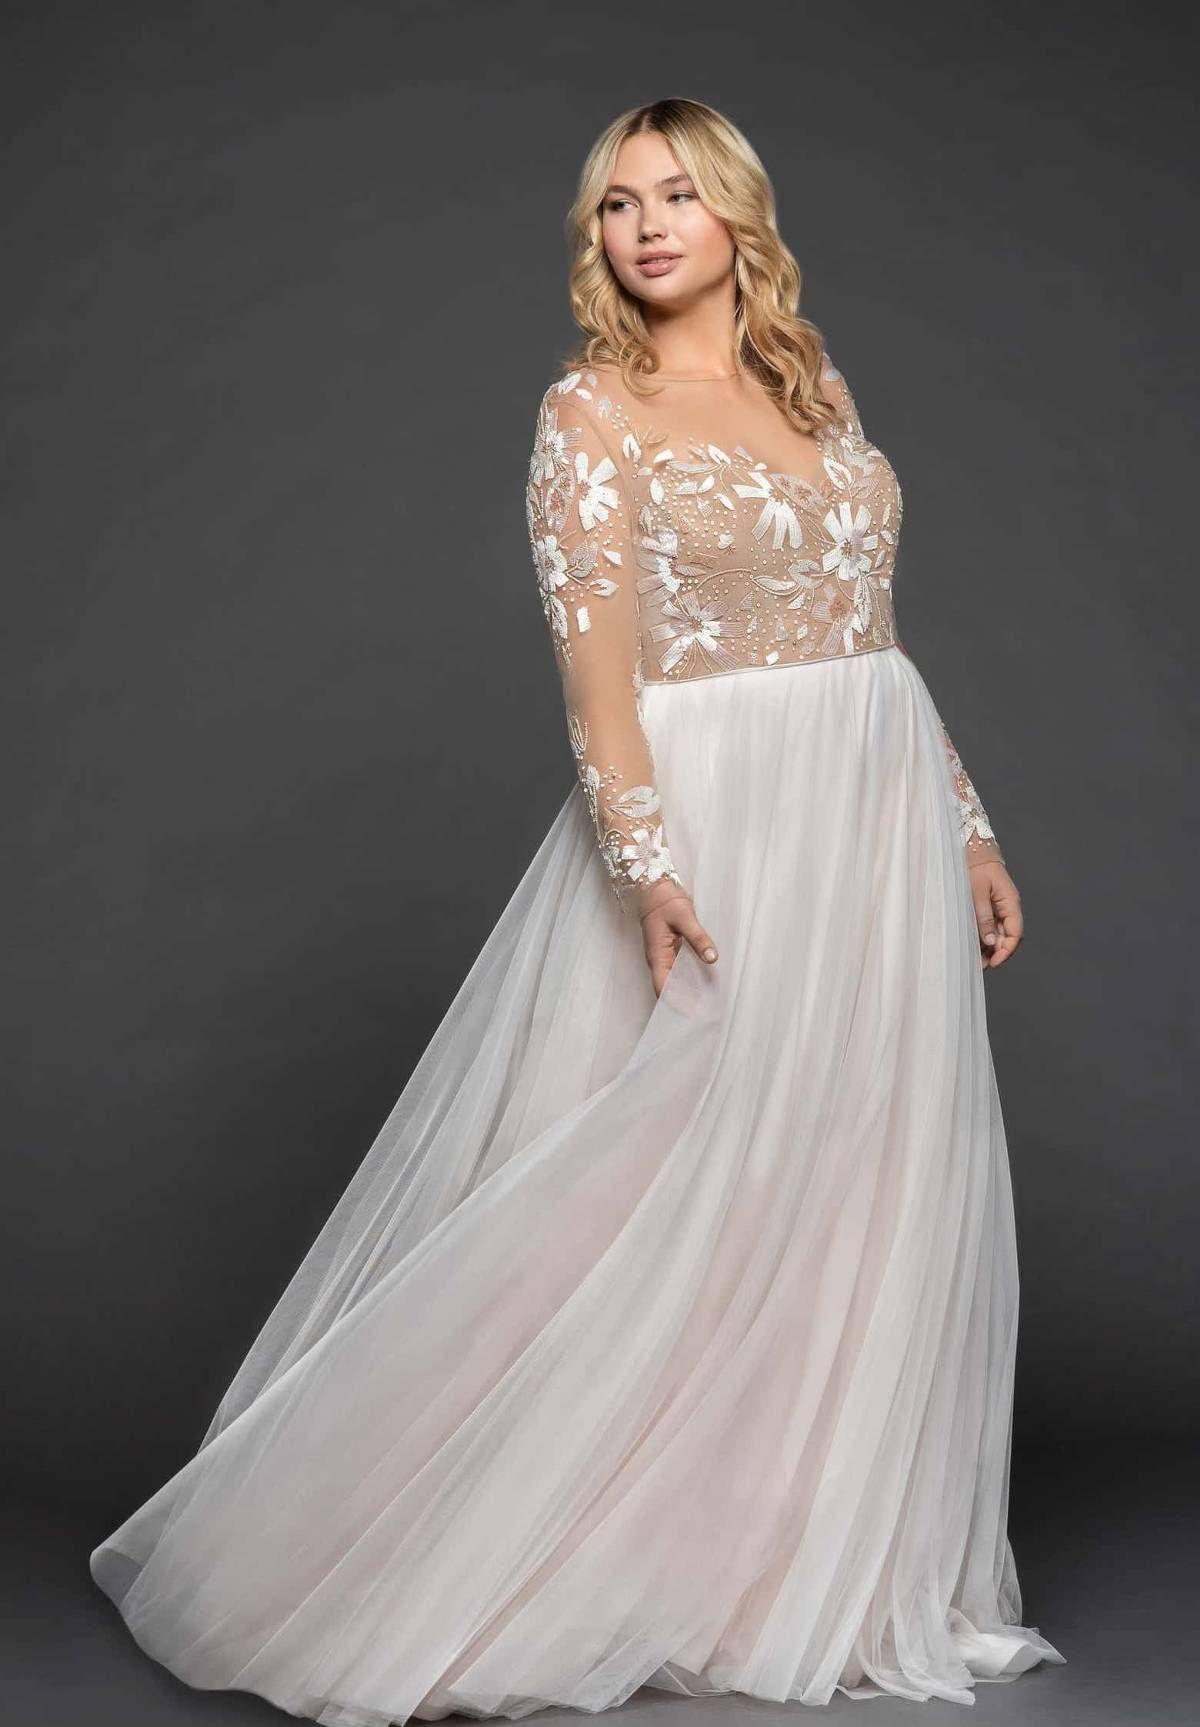 The One Dress Style Every Winter Bride Should Consider Wedding Dresses Plus Size Wedding Dress Long Sleeve Wedding Dresses [ 1727 x 1200 Pixel ]